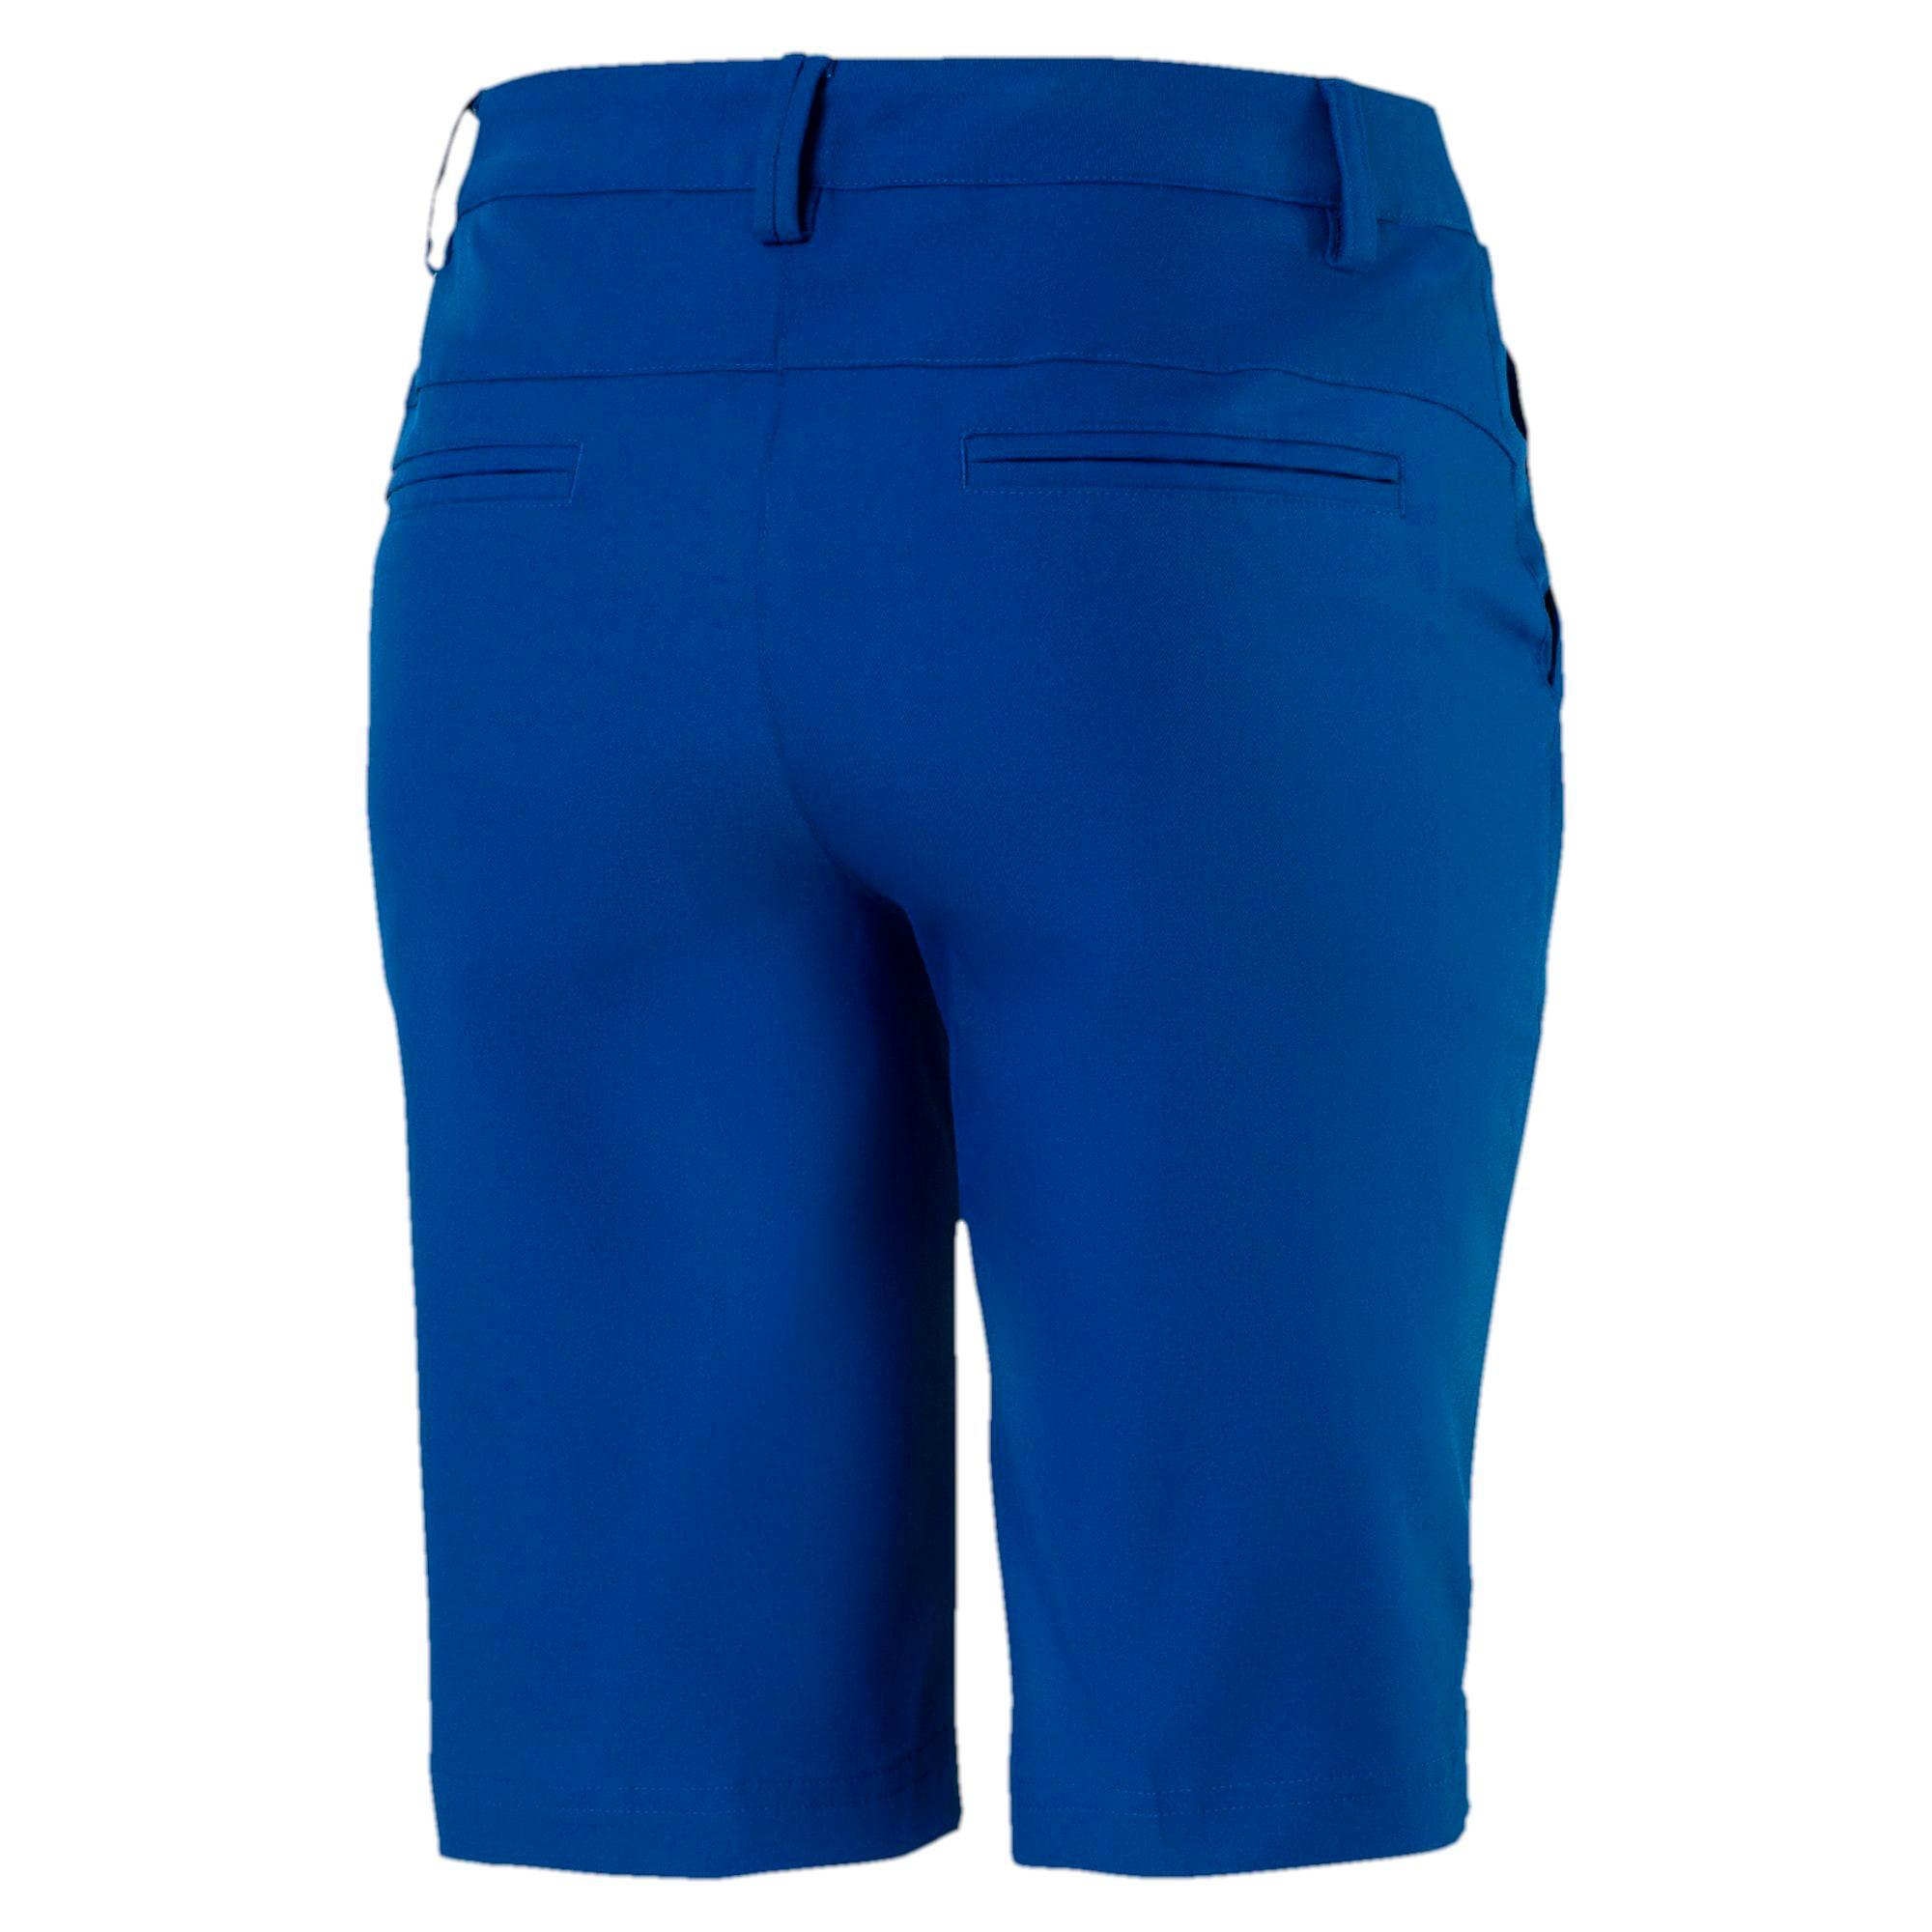 Thumbnail 5 of Pounce Bermuda Shorts, TRUE BLUE, medium